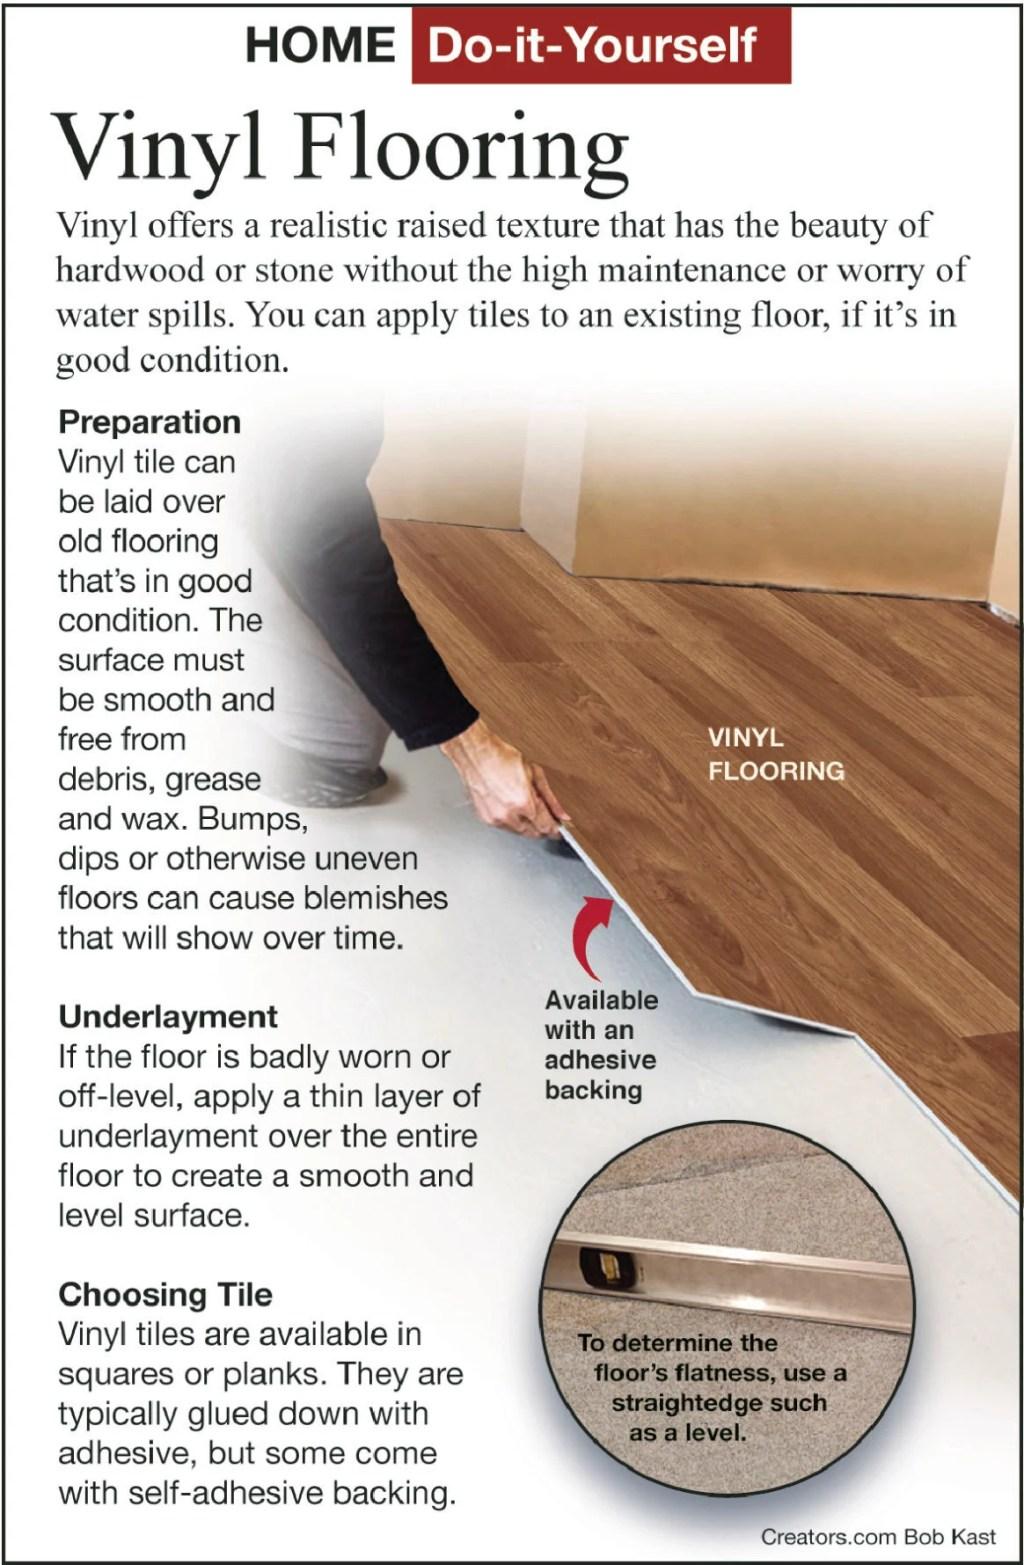 a new heavy duty commercial vinyl floor